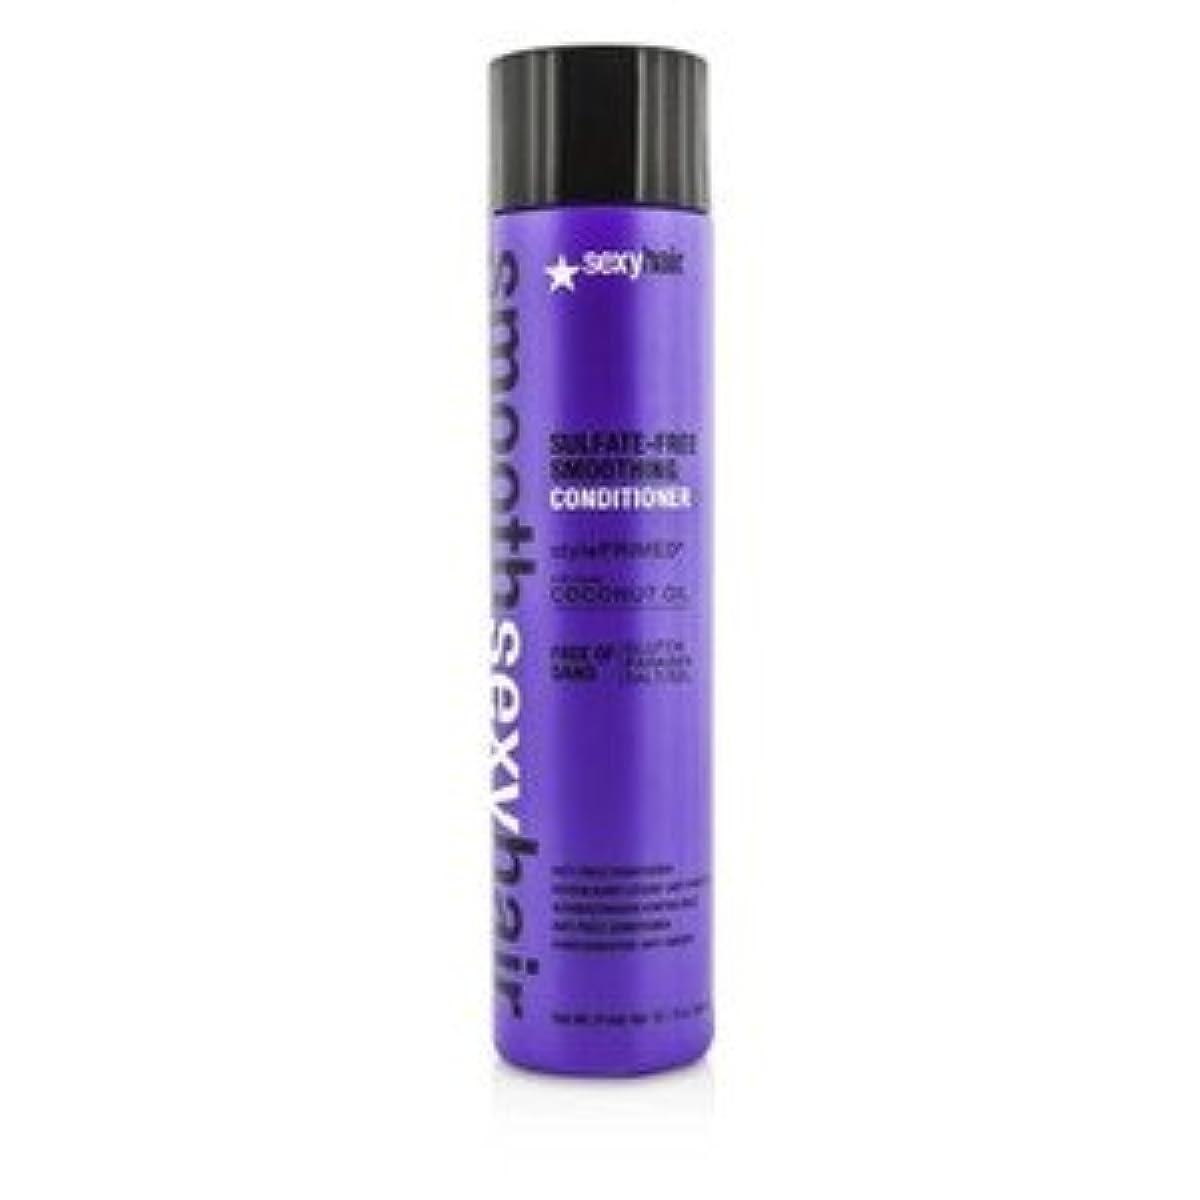 Sexy Hair スムース セクシー ヘア サルフェートフリー スムージング コンディショナー(Anti-Frizz) 300ml/10.1oz [並行輸入品]